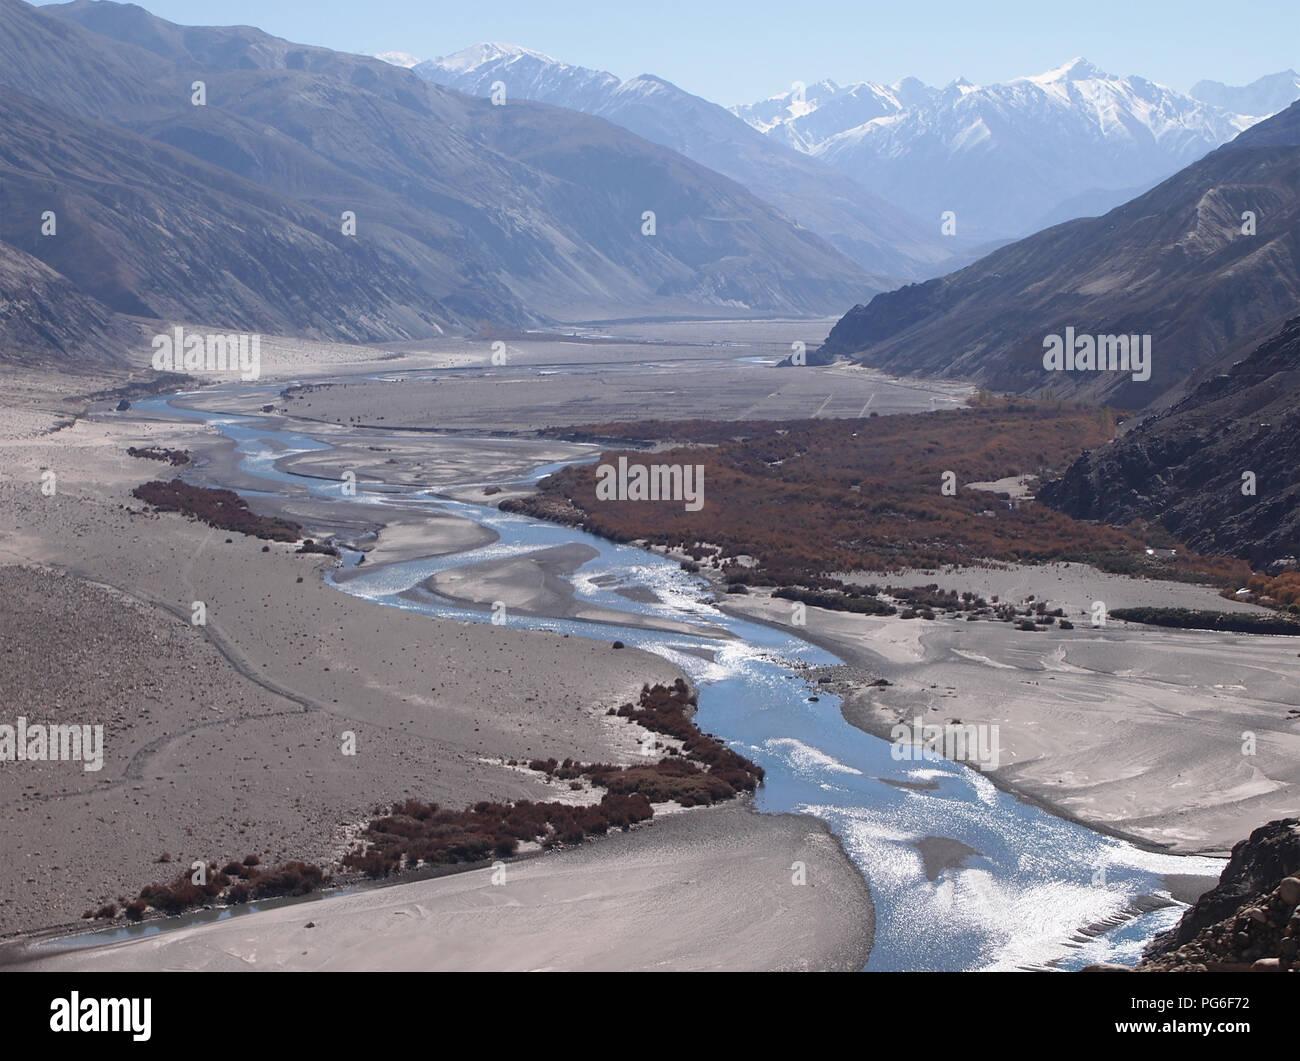 The Nubra valley, Ladakh, between the Himalayas and the Karakoram ranges - Stock Image